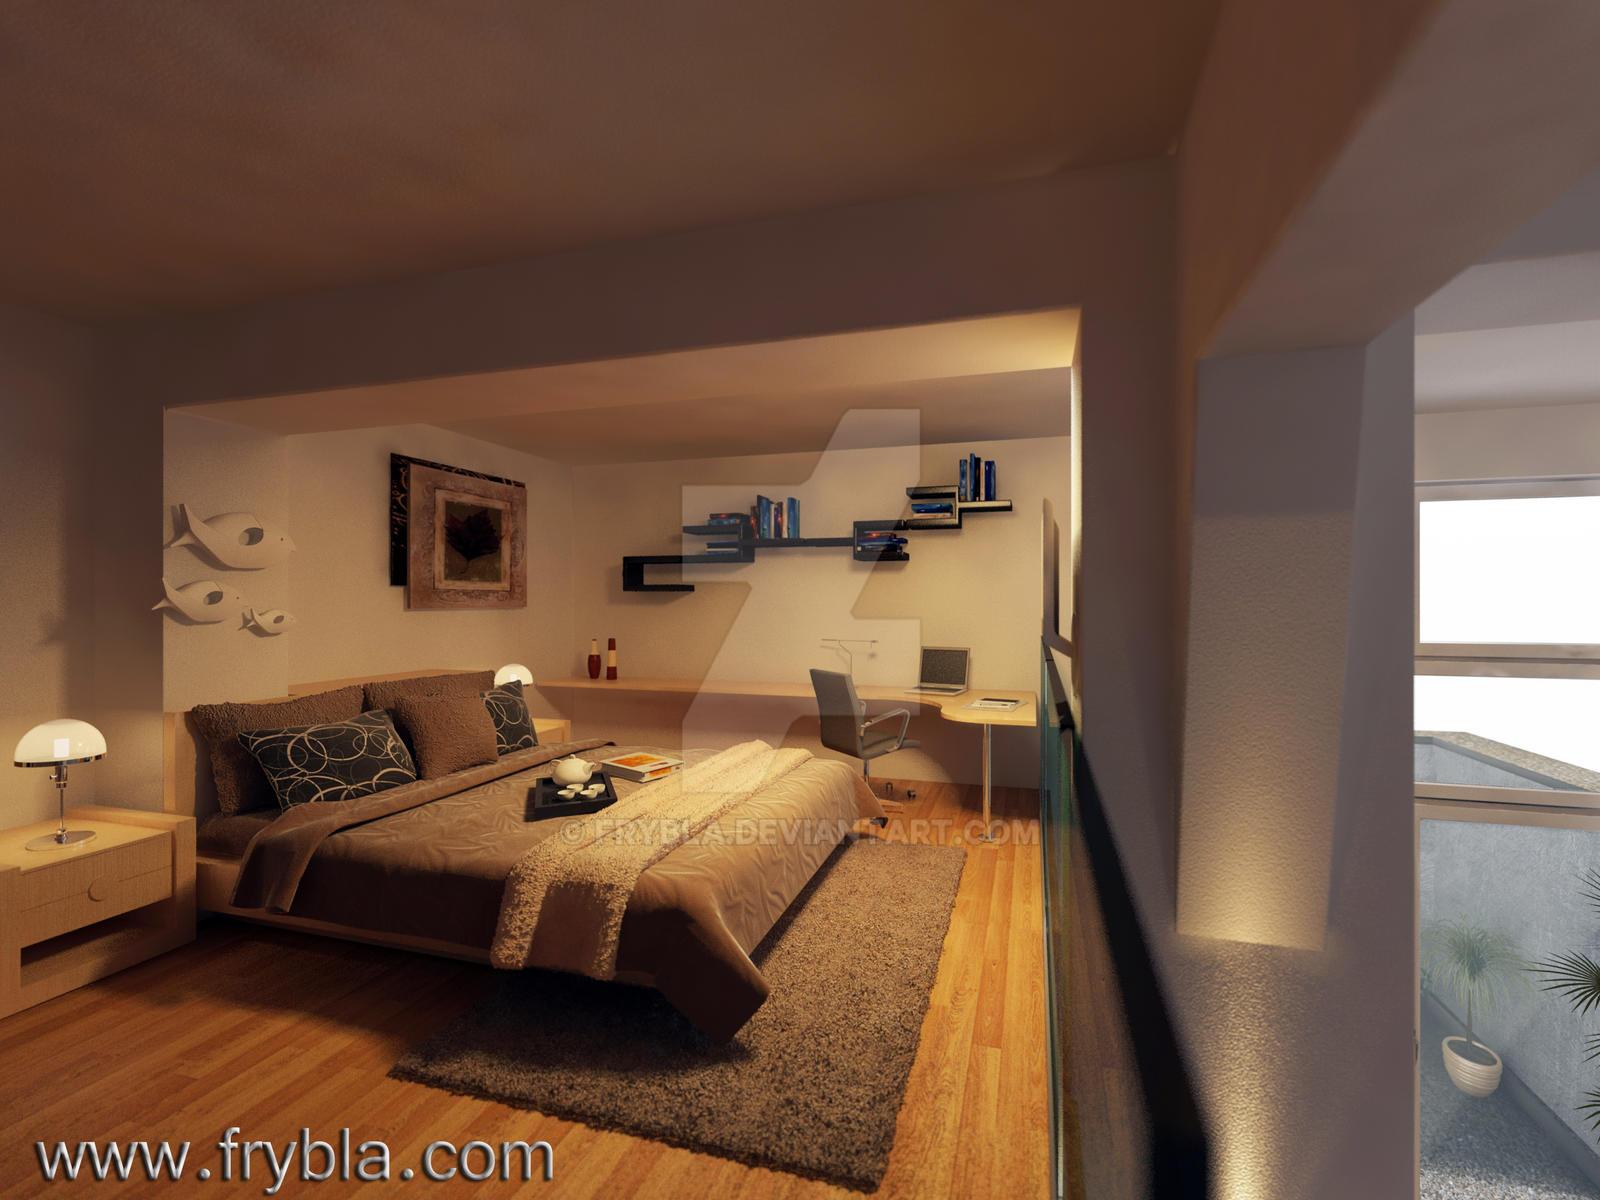 bedroom 3d rendering interior design by frybla